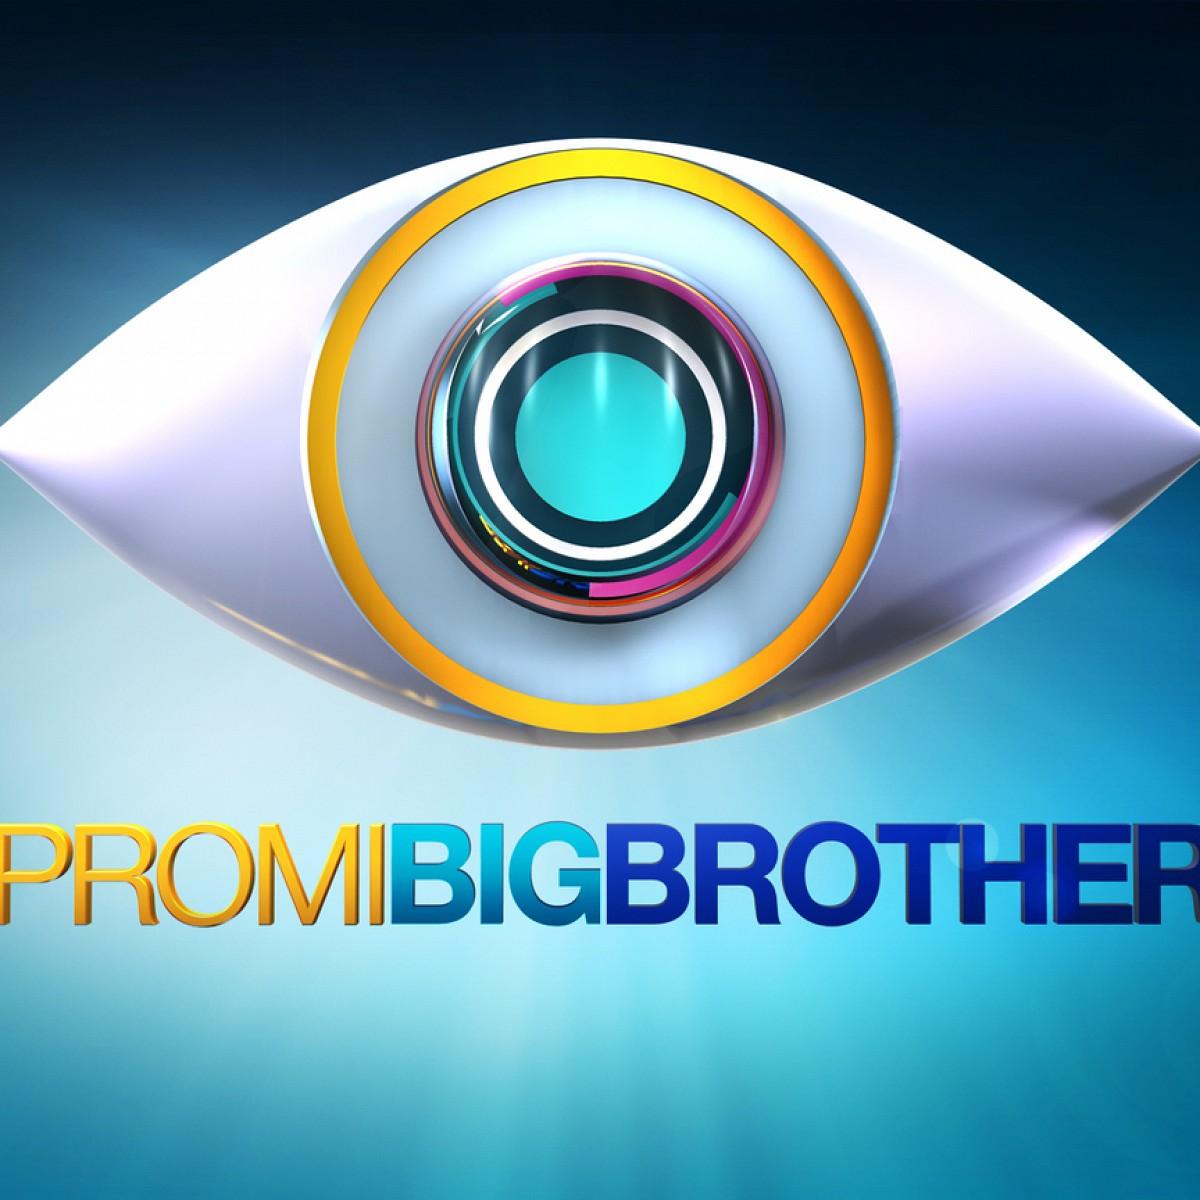 Promi Big Brother 24 Stunden Live Kostenlos